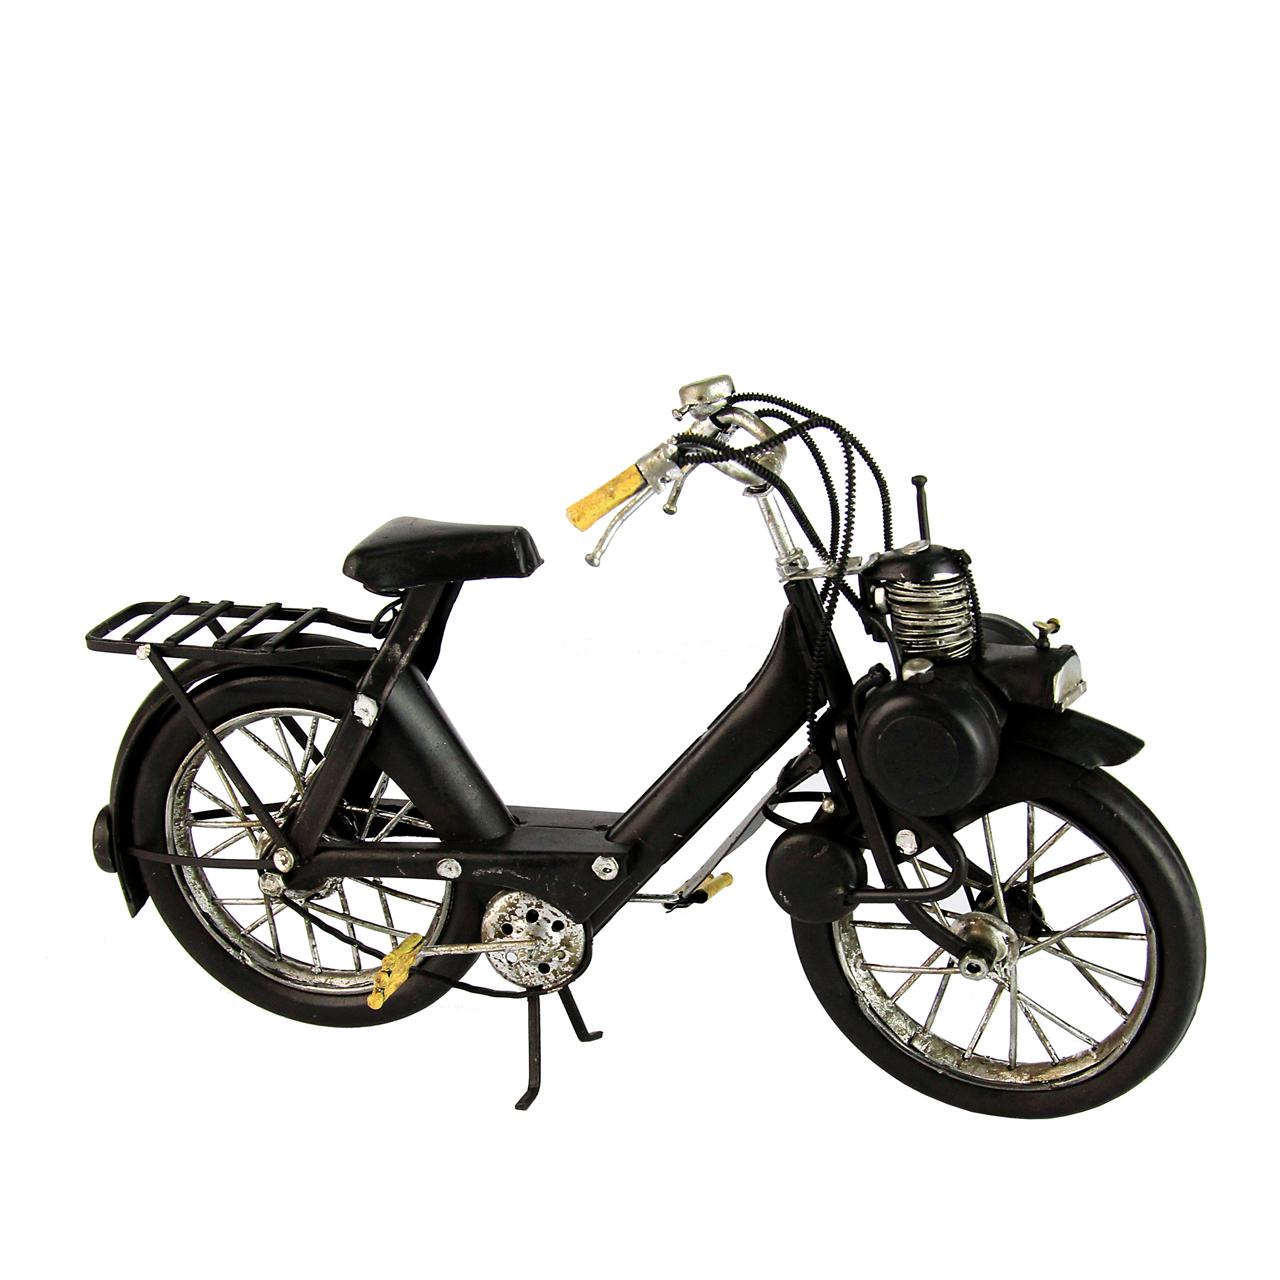 Macheta Bicicleta Din Metal Negru 23 Cm